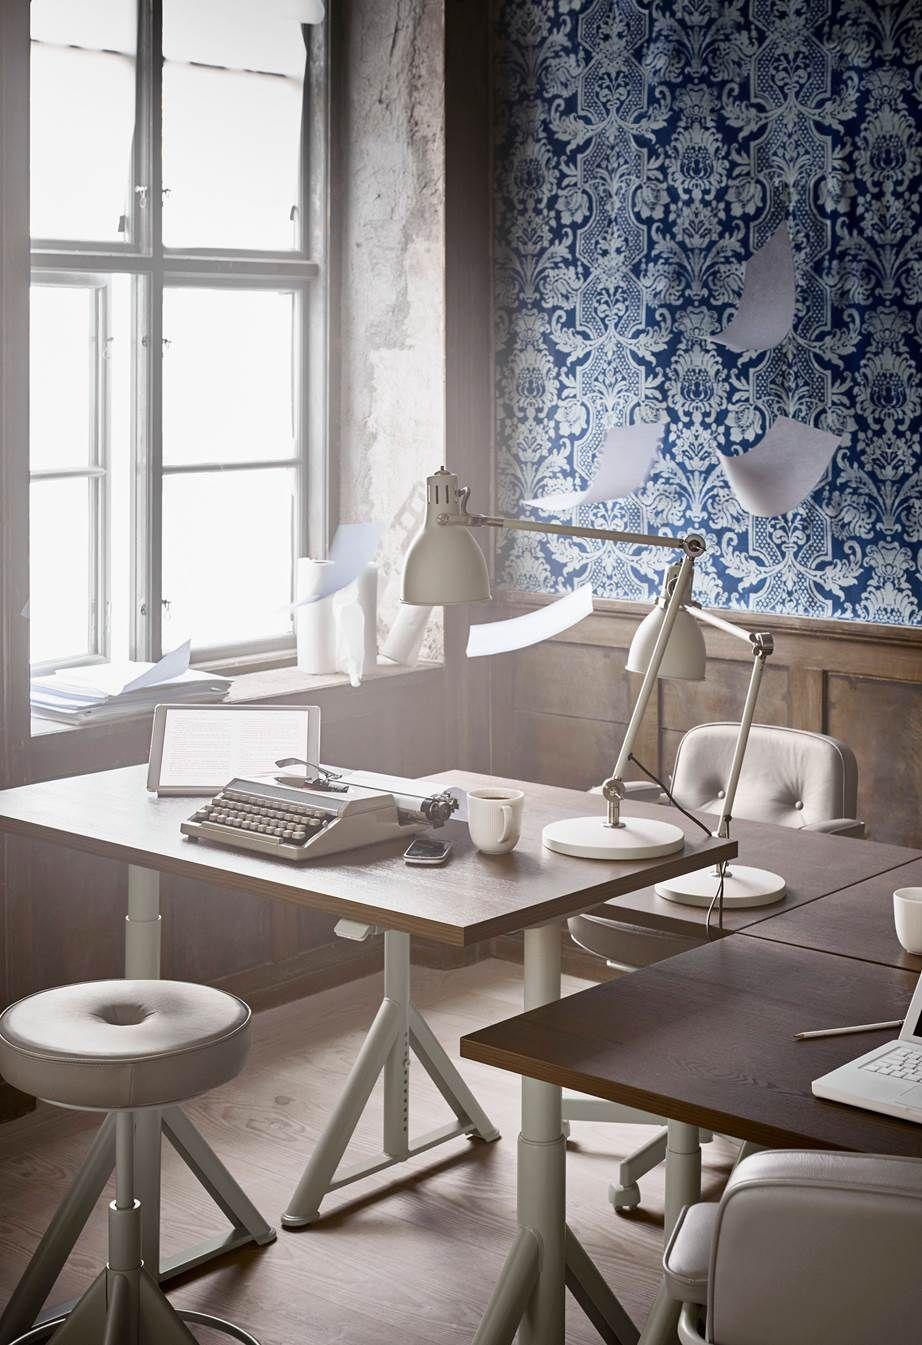 Ikea Australias October Range Is Full Of Quirky Design